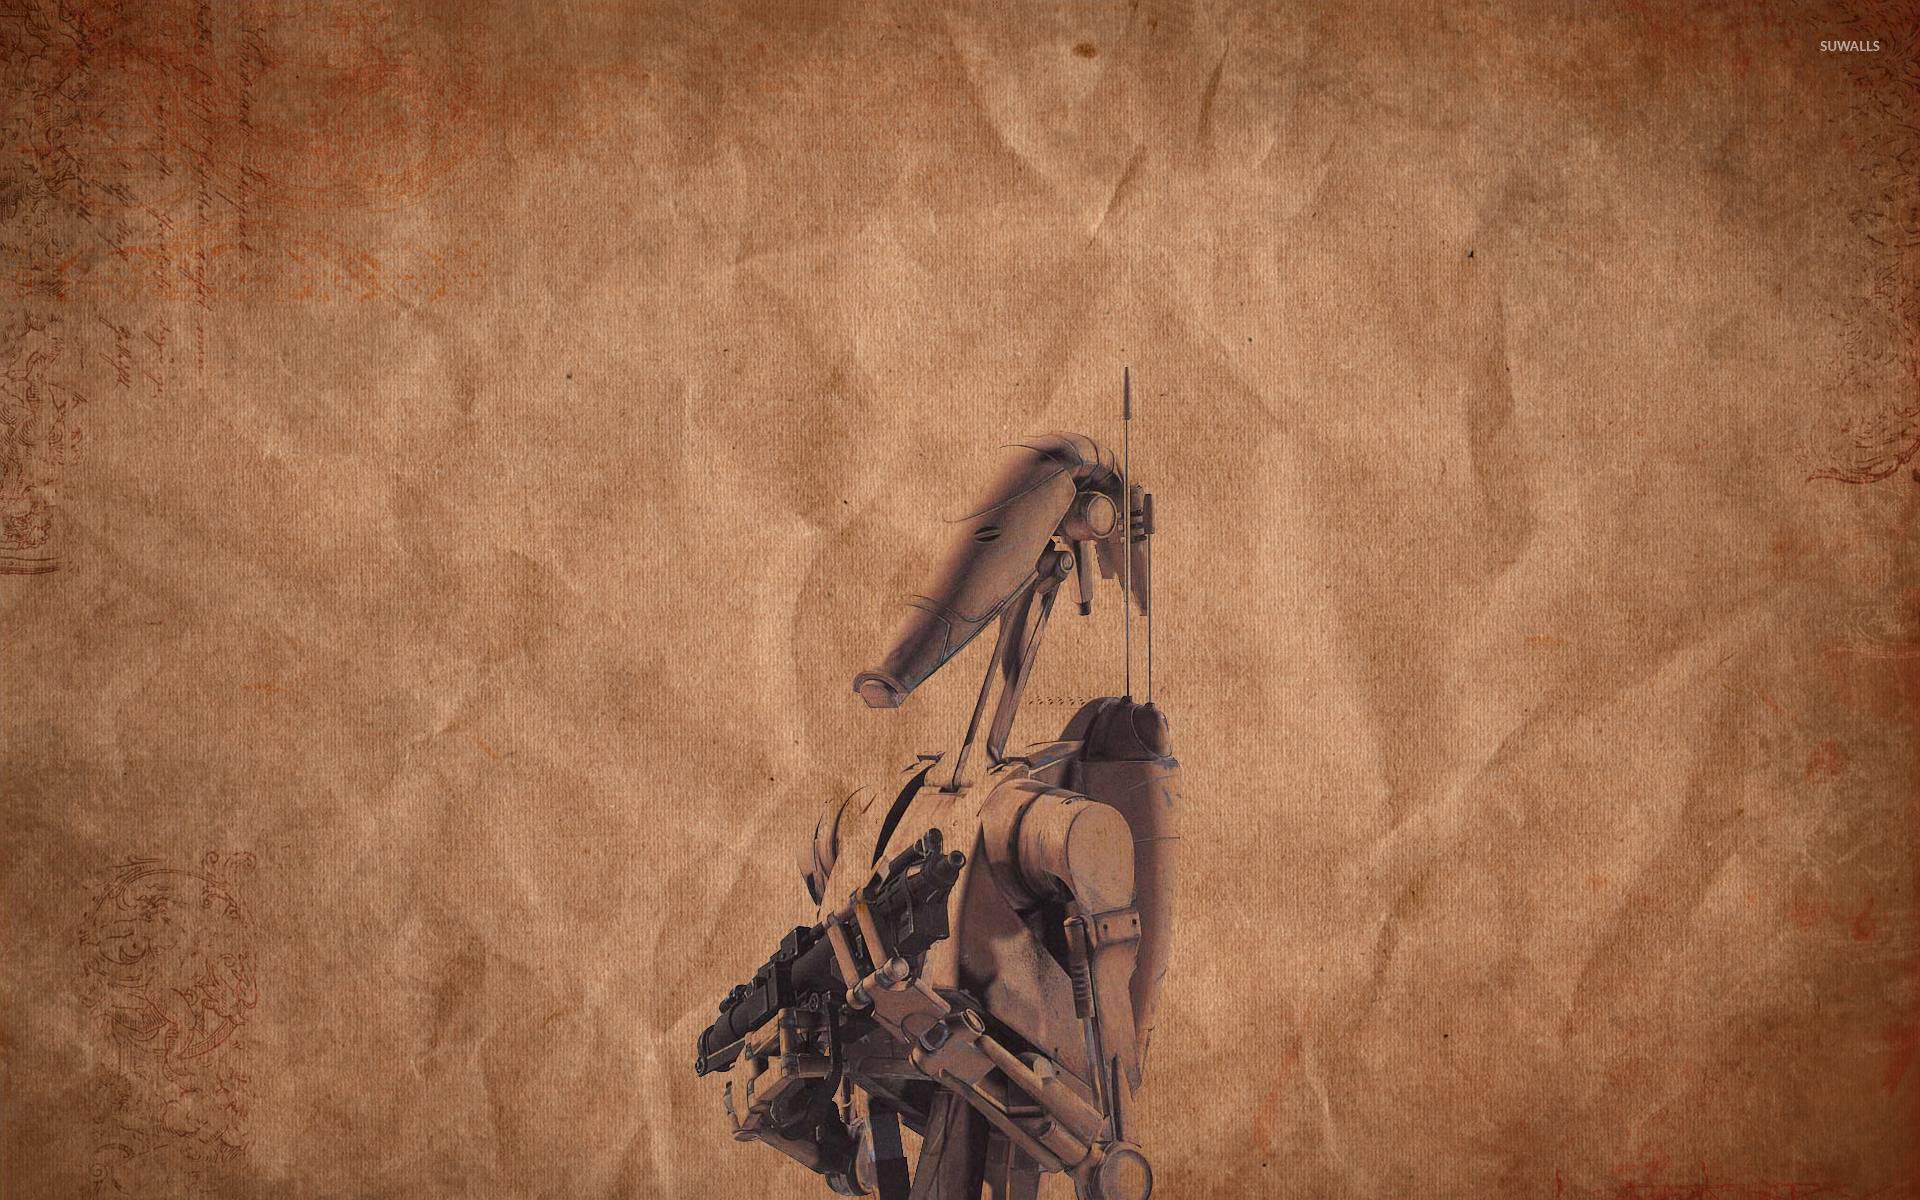 B1 battle droid wallpaper